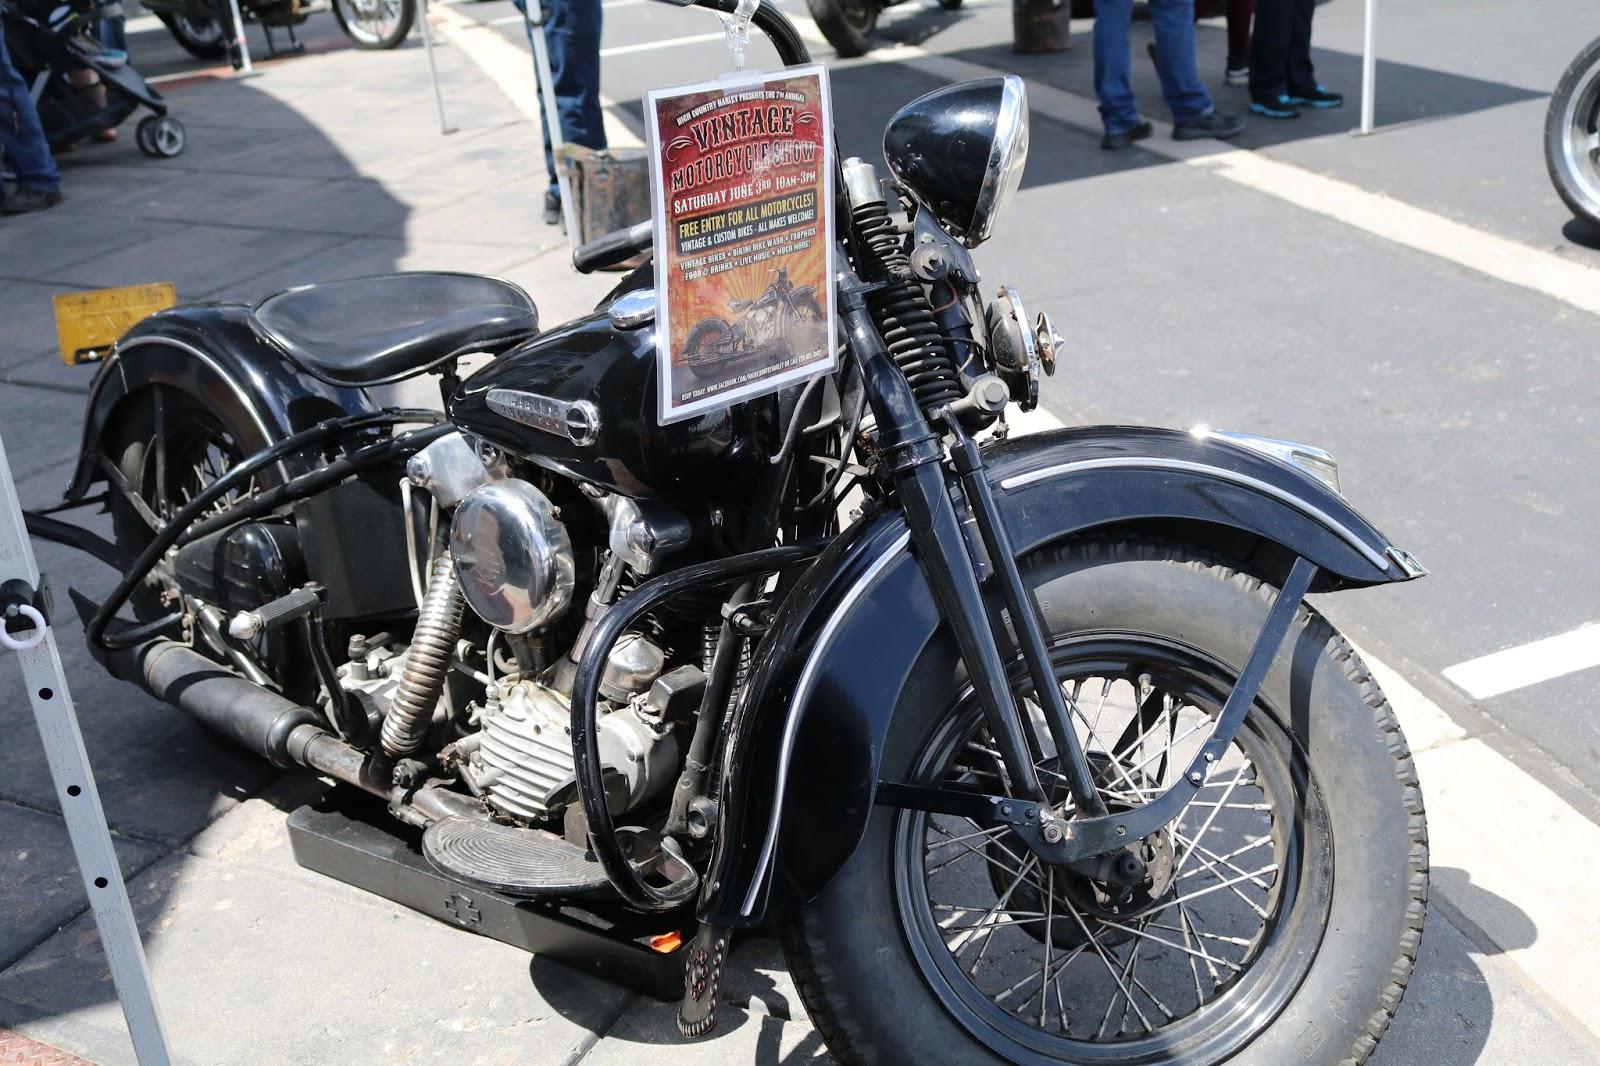 Oldmotodude 1947 Harley Davidson Knucklehead On Display